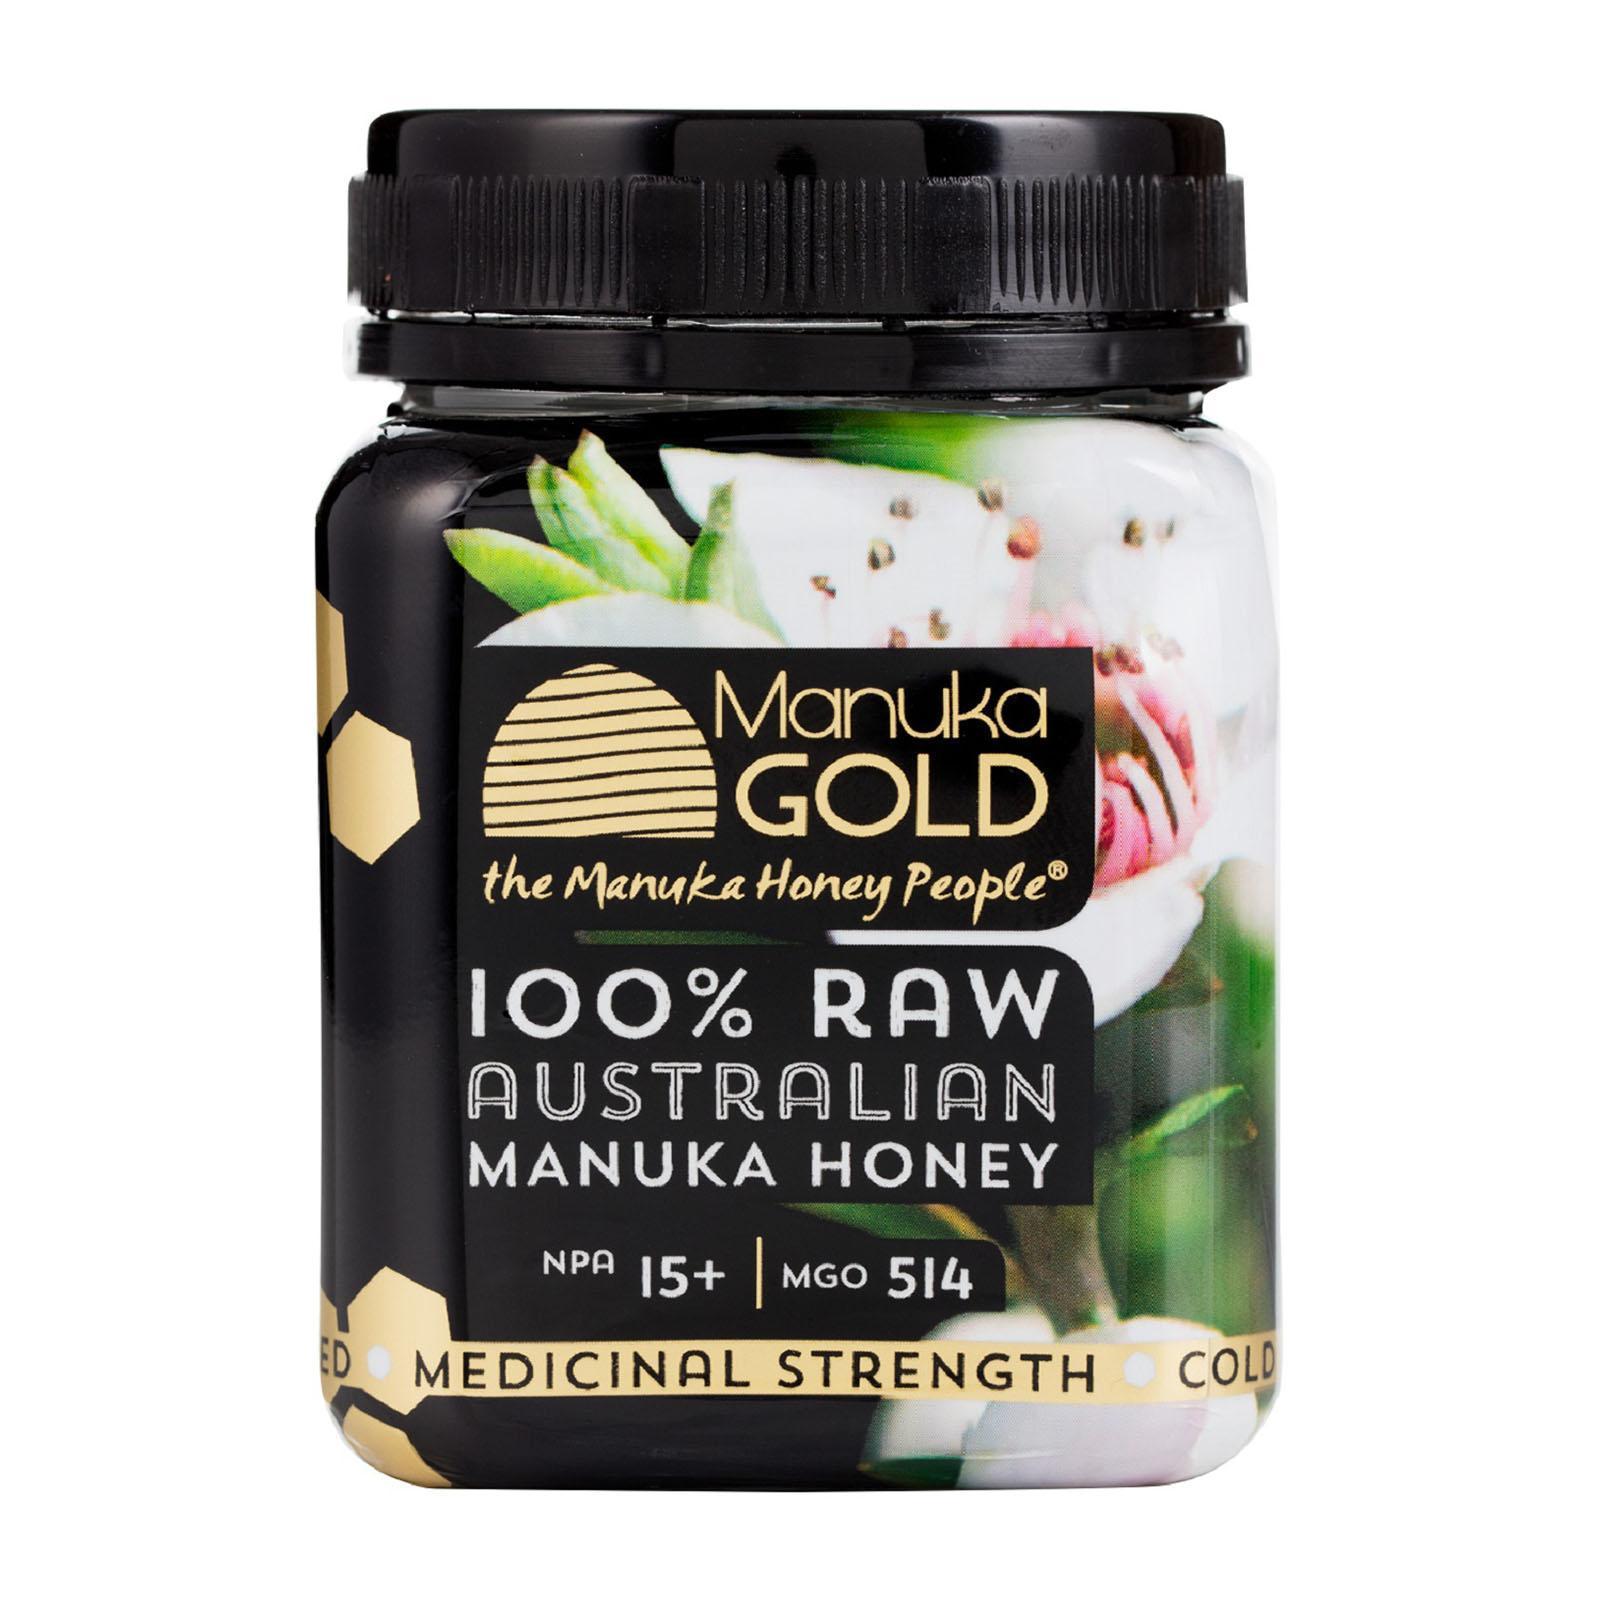 Nature's Gold 100% Raw Australian Manuka Honey 15+